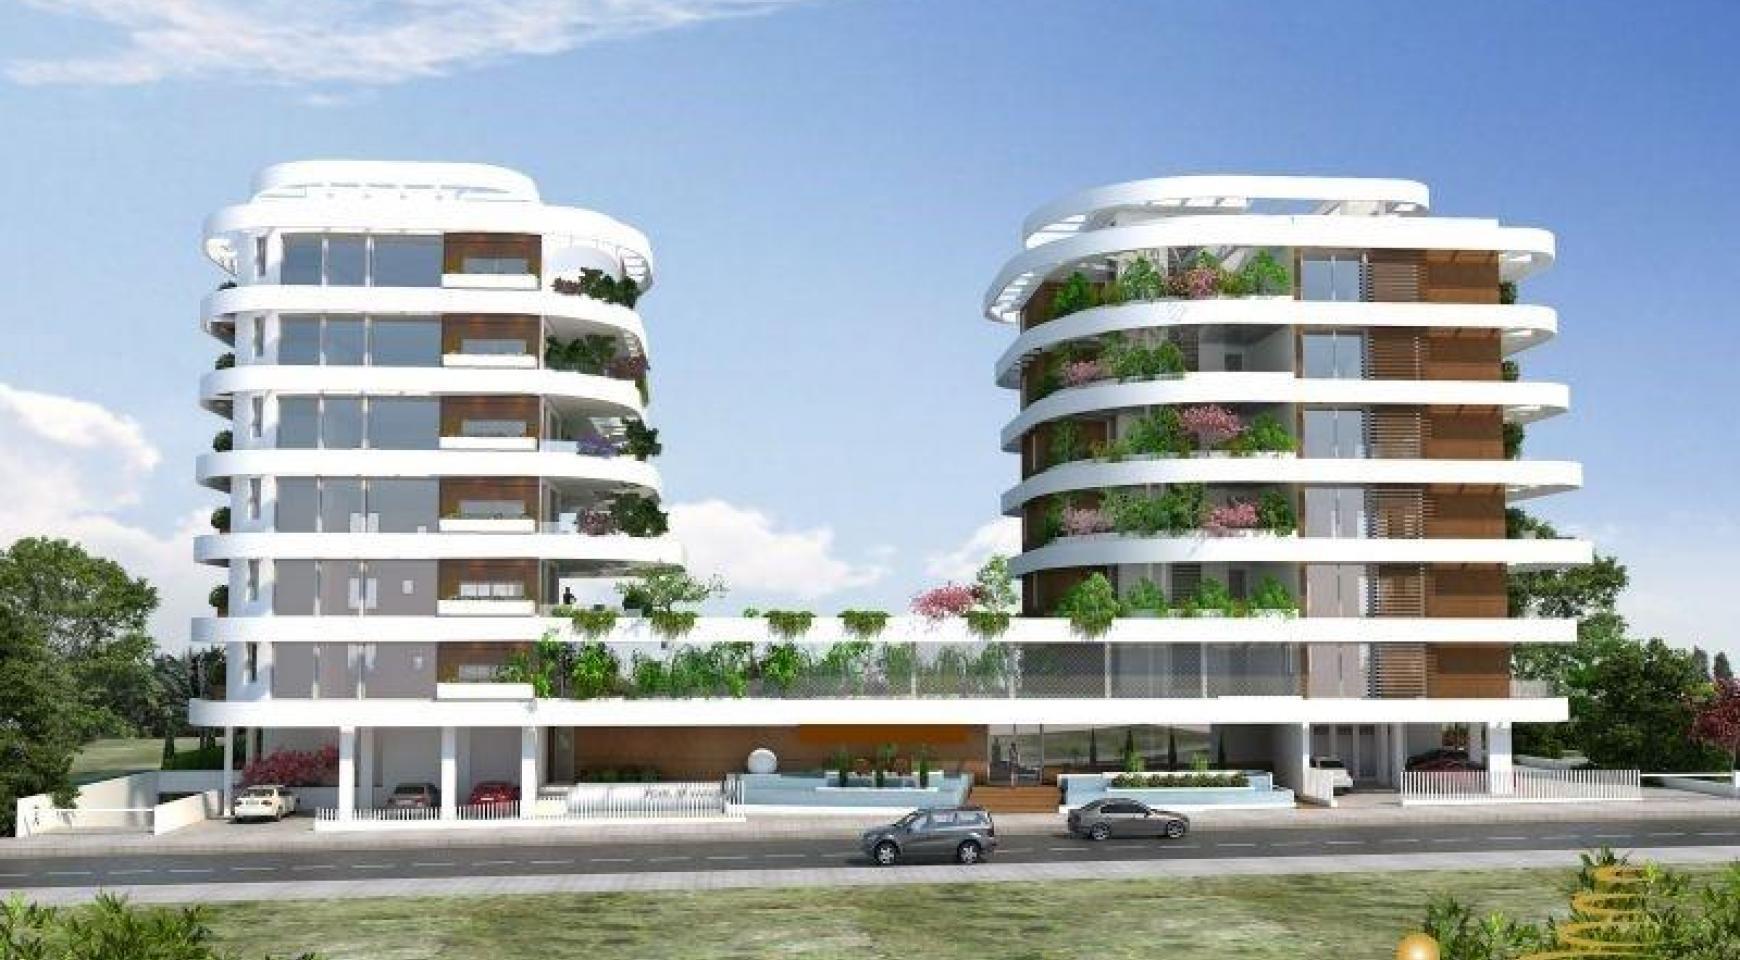 New 2 Bedroom Apartment with Garden - 2